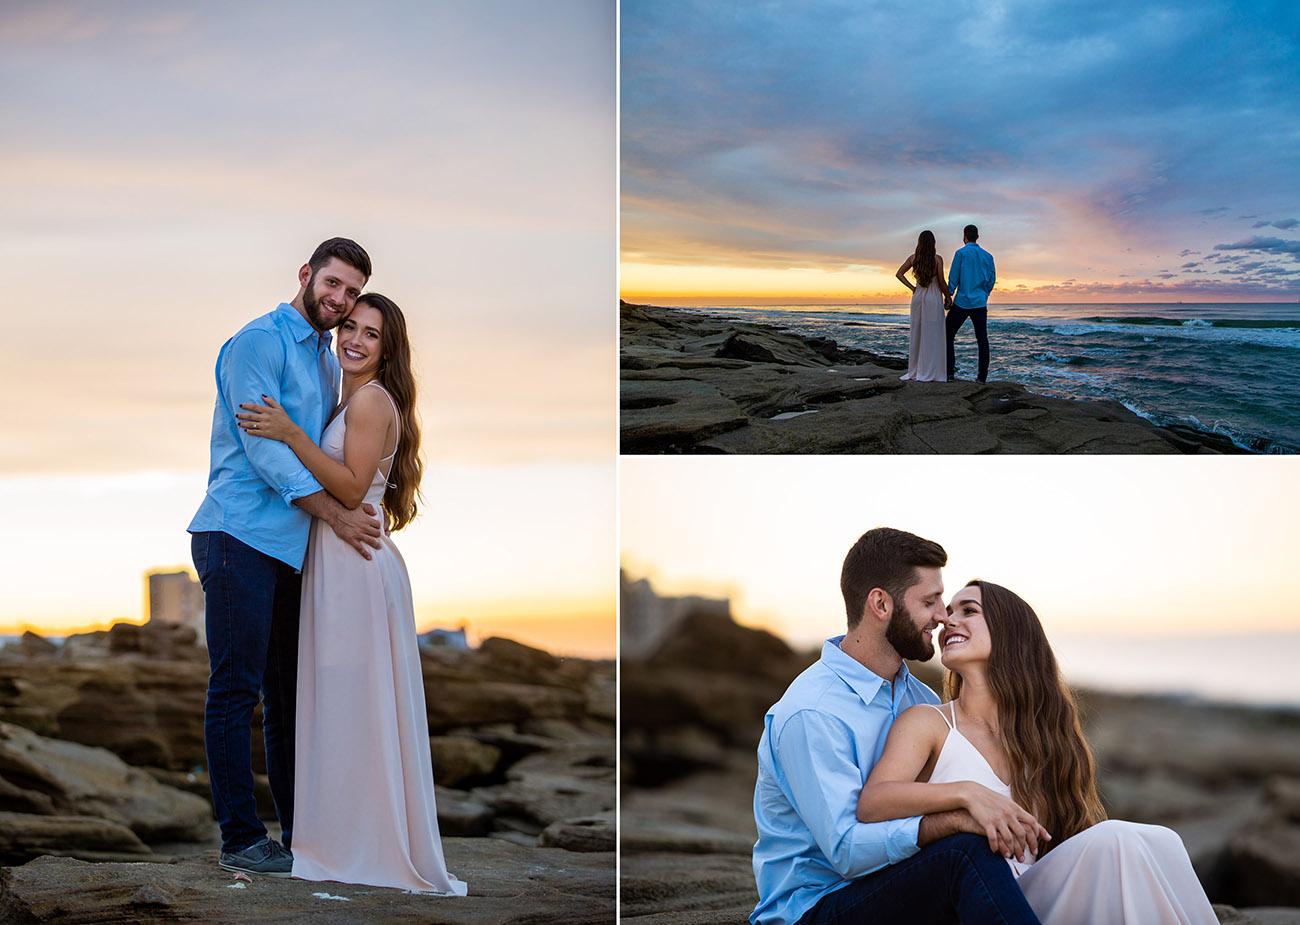 adam-szarmack-jacksonville-wedding-photographer-palm-coast-washing-oaks-garden-state-park-engagement-55.jpg